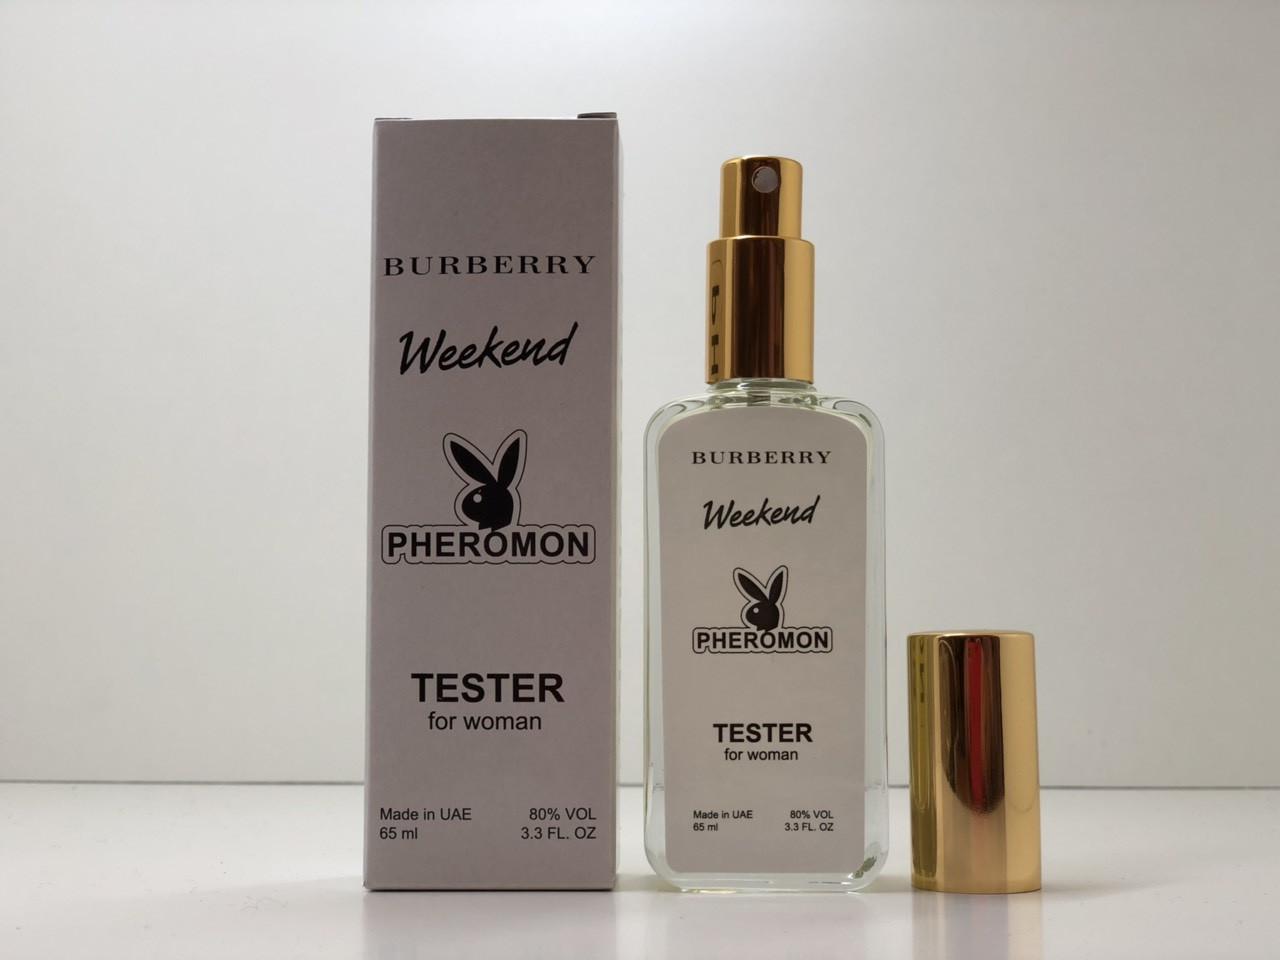 Burberry Weekend женский парфюм тестер с феромонами 65 ml производства ОАЭ (реплика)